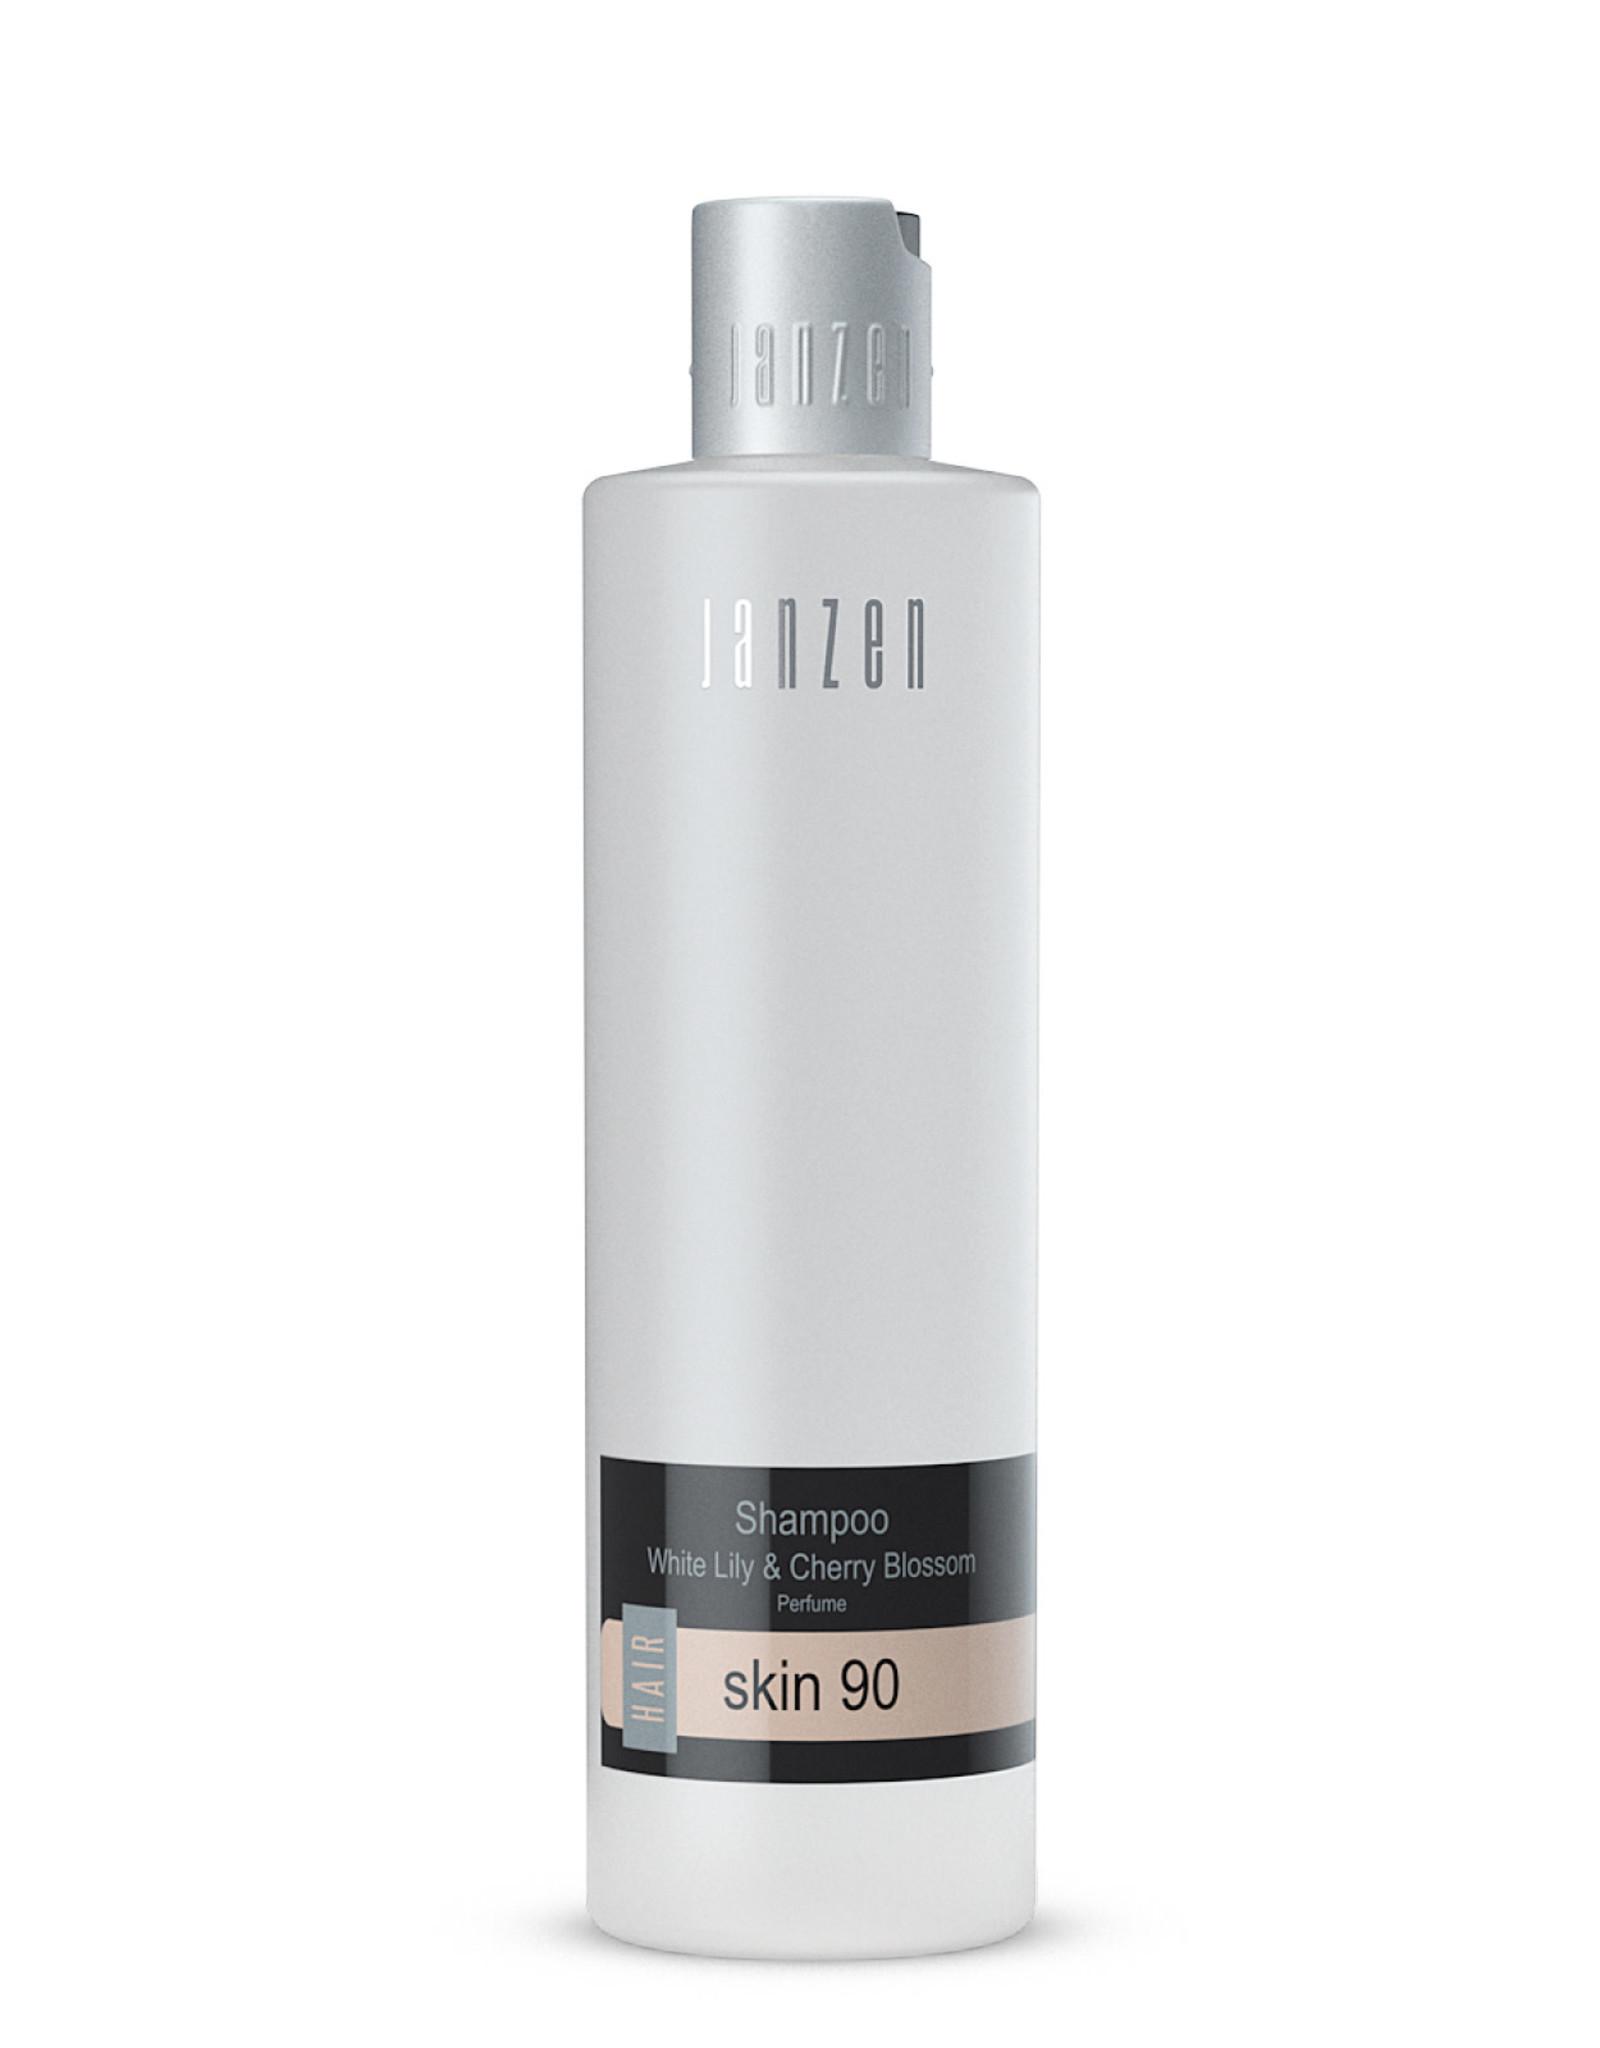 JANZEN Shampoo Skin 90 300ml - JANZEN